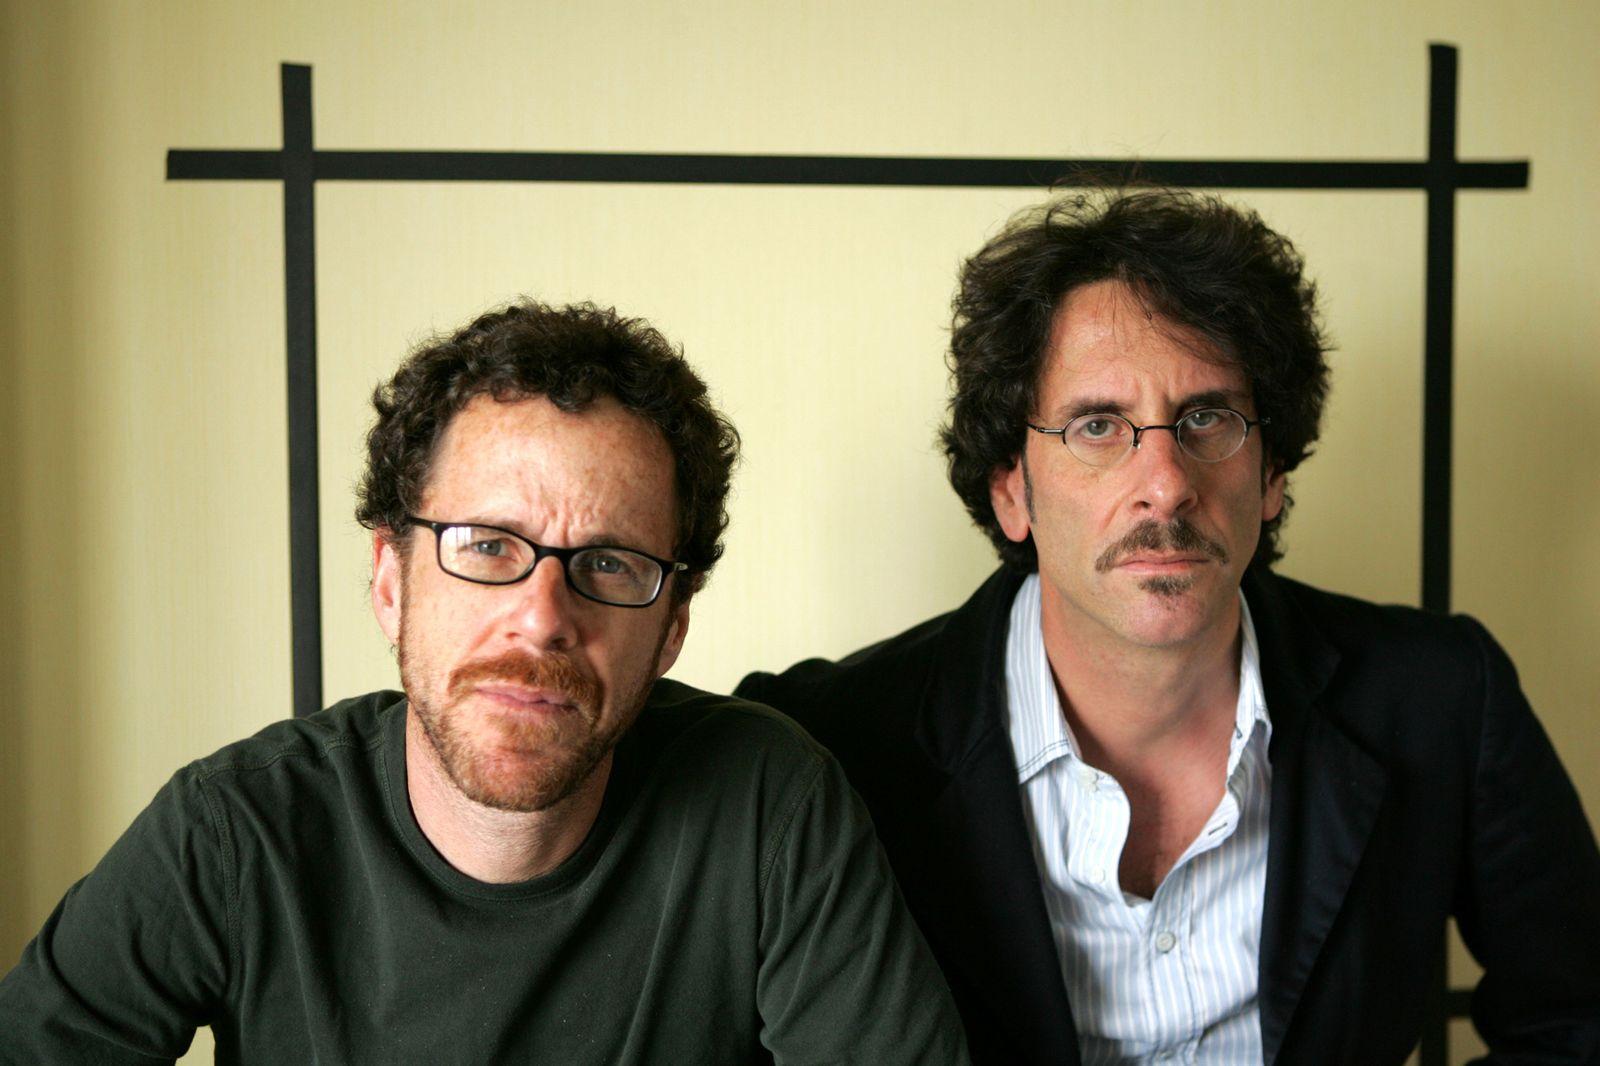 Joel und Ethan Coen